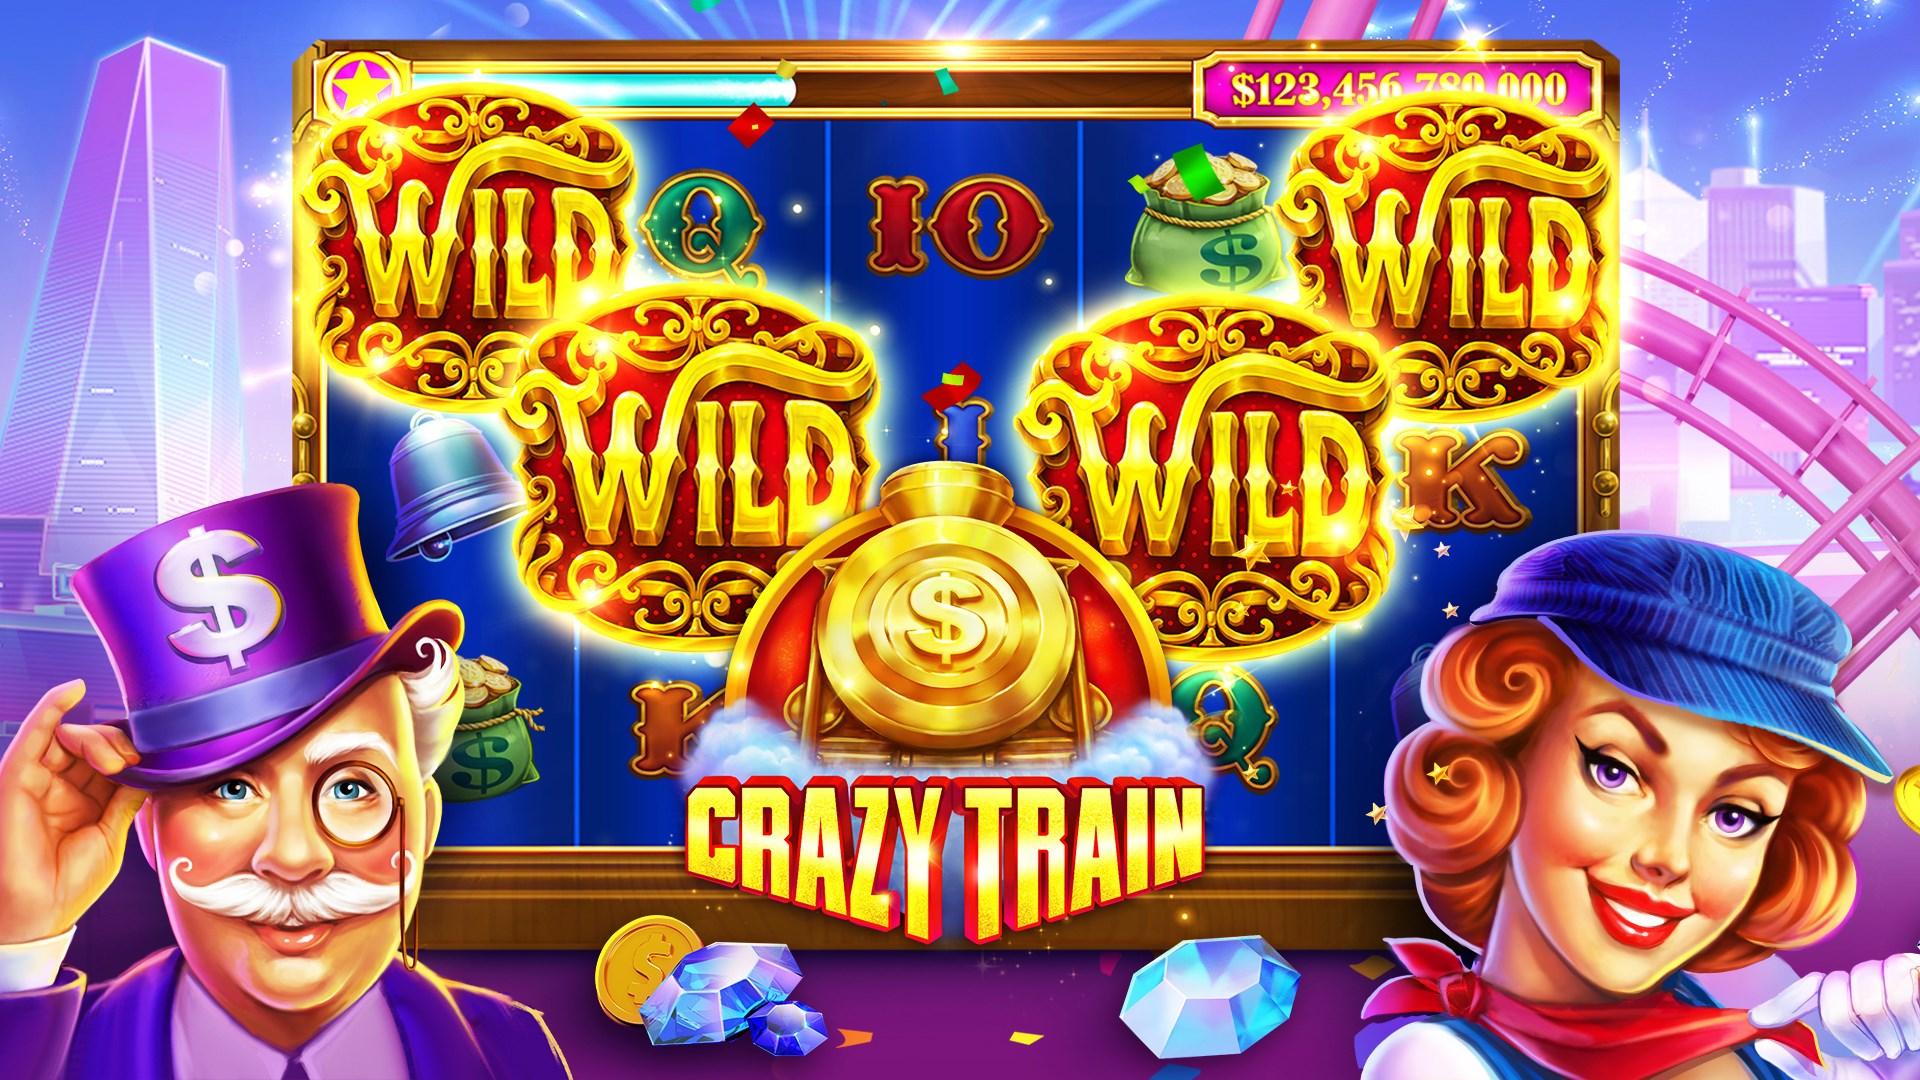 Free Amaya Slots To Play Online